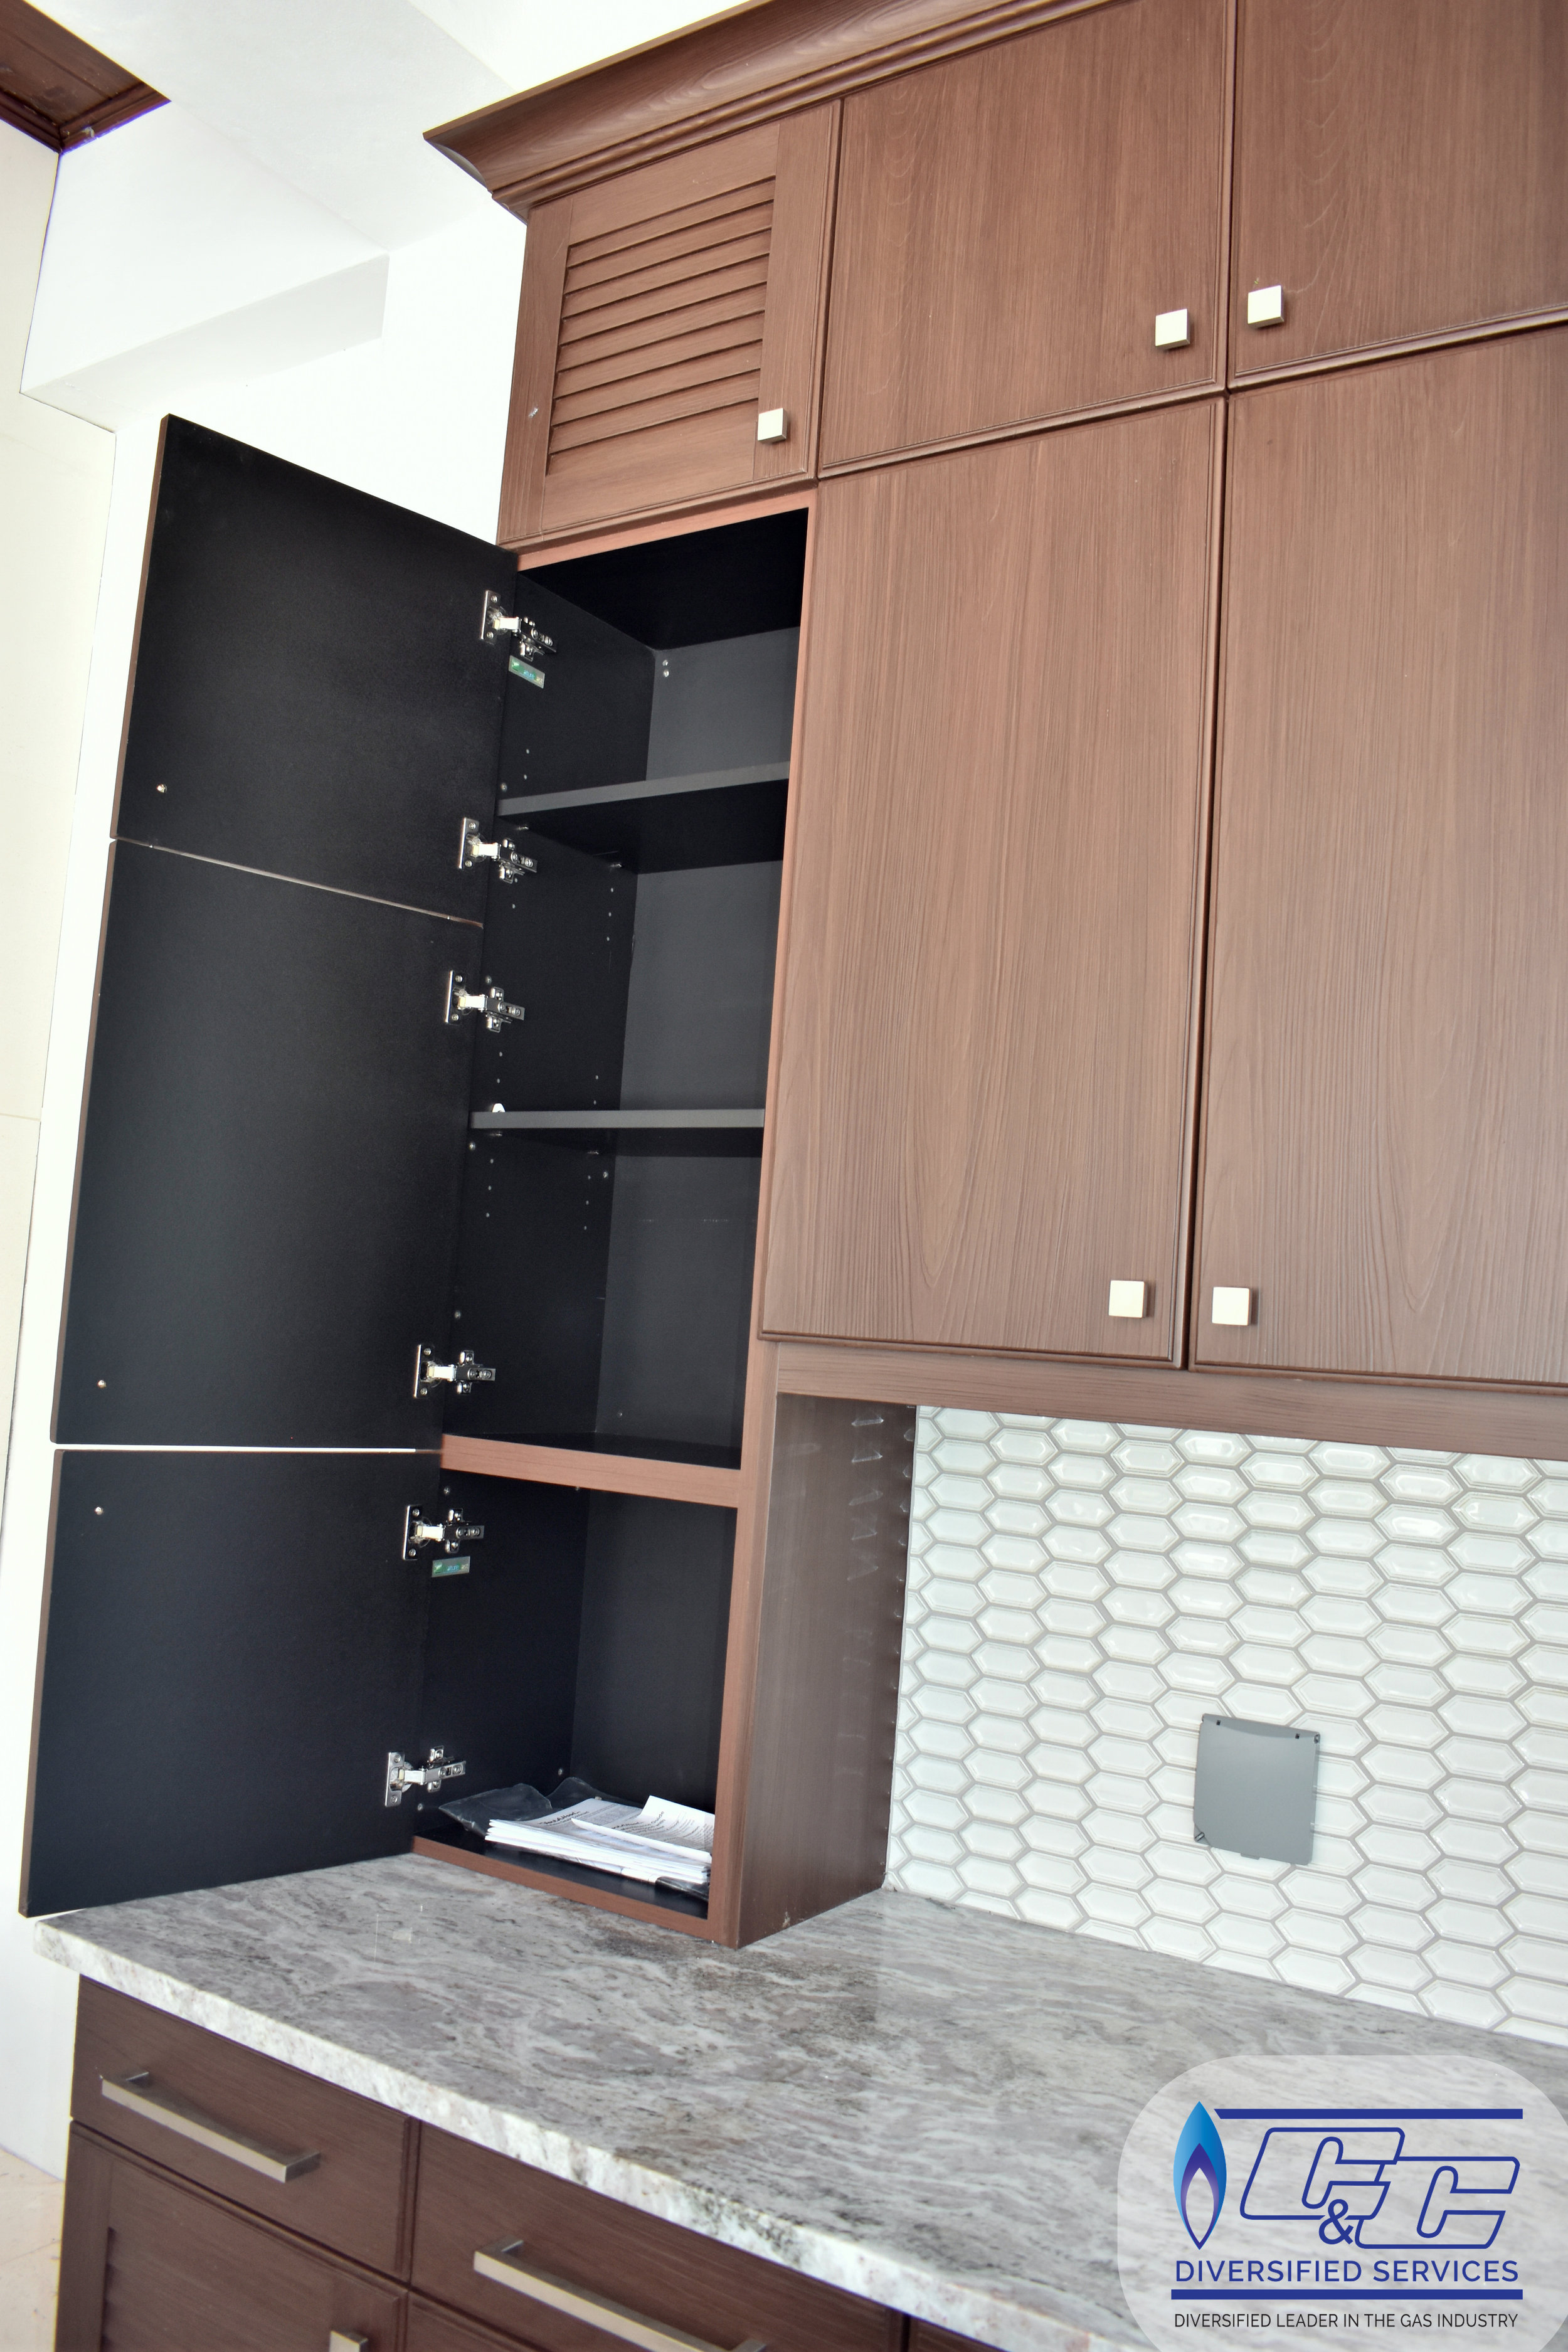 NatureKast Weatherproof Cabinetry - Cabinets, Doors & Drawers